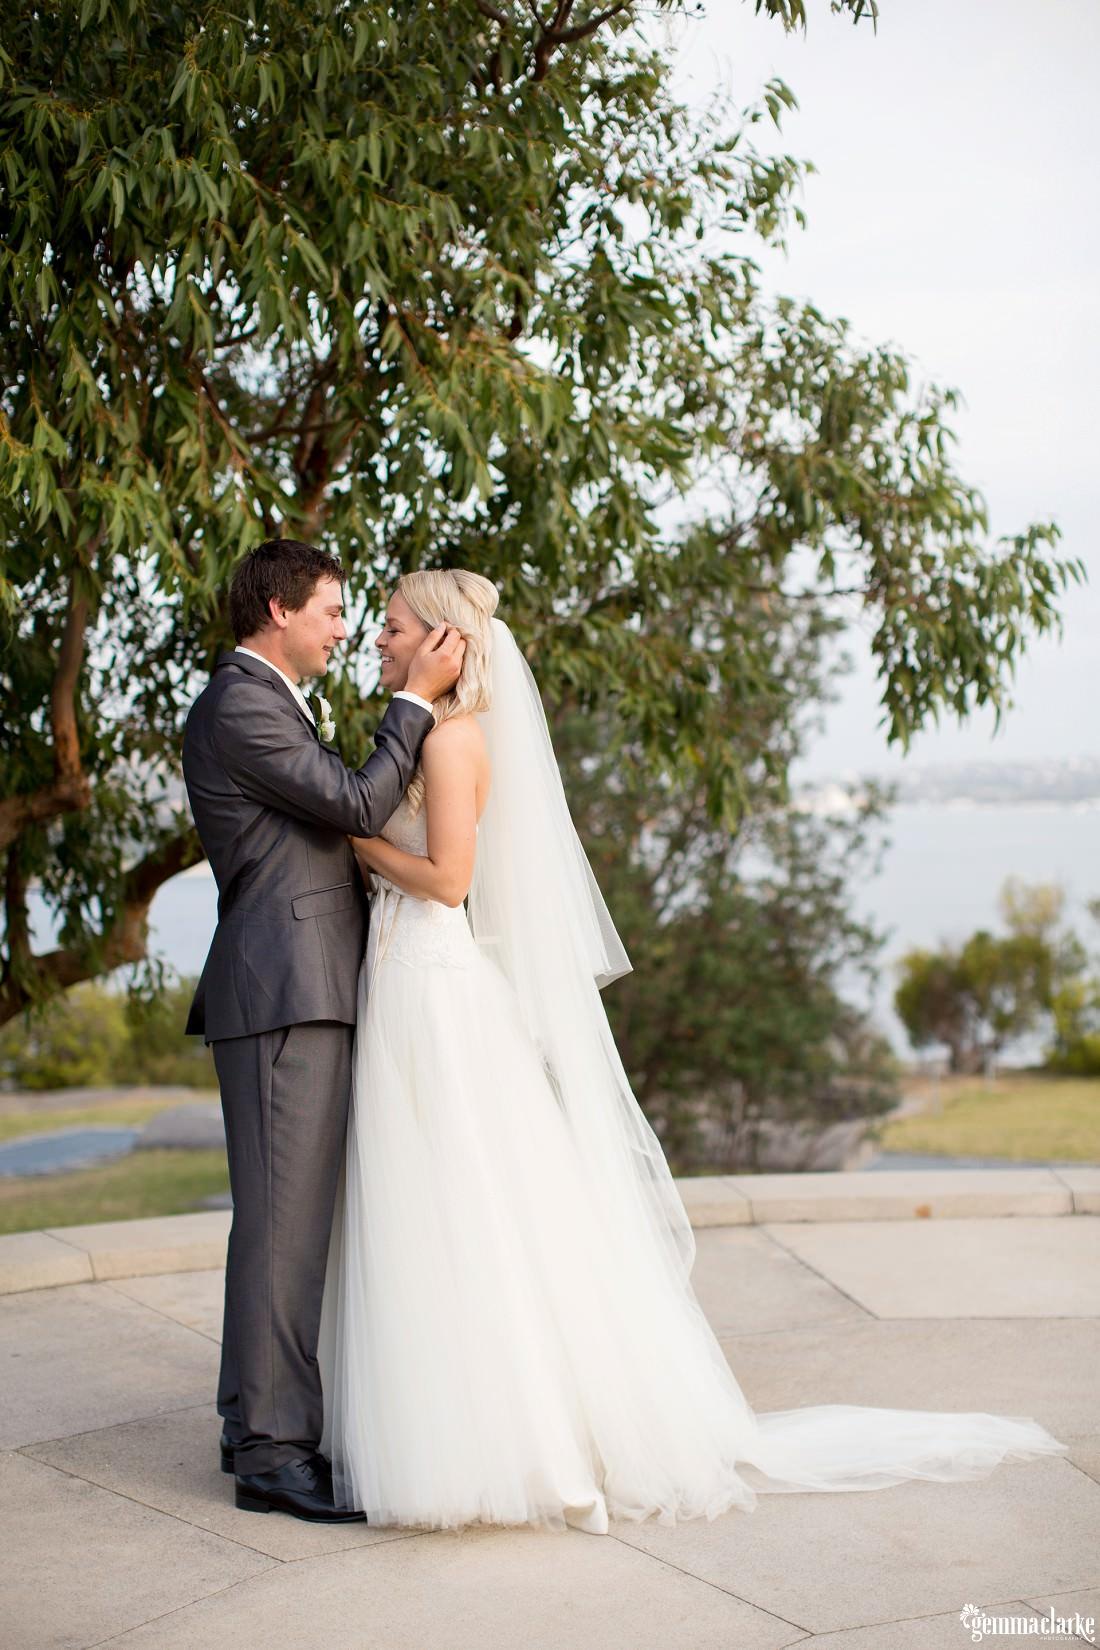 gemma-clarke-photography_gunners-barracks-wedding_tearooms-wedding_ellie-and-sam_0042